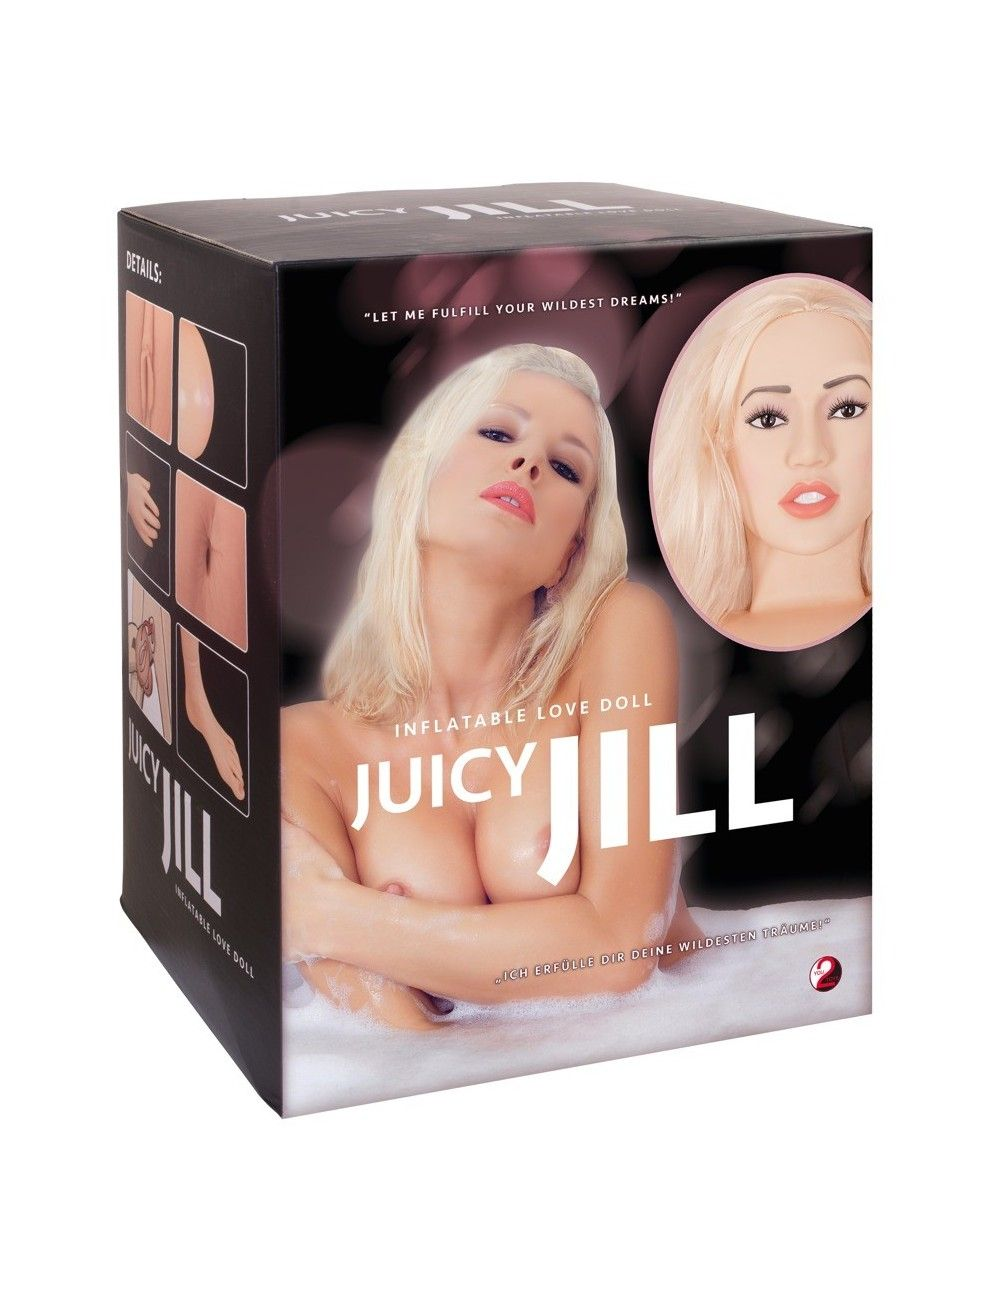 Poupée gonflable Juicy Jill You 2 Toys